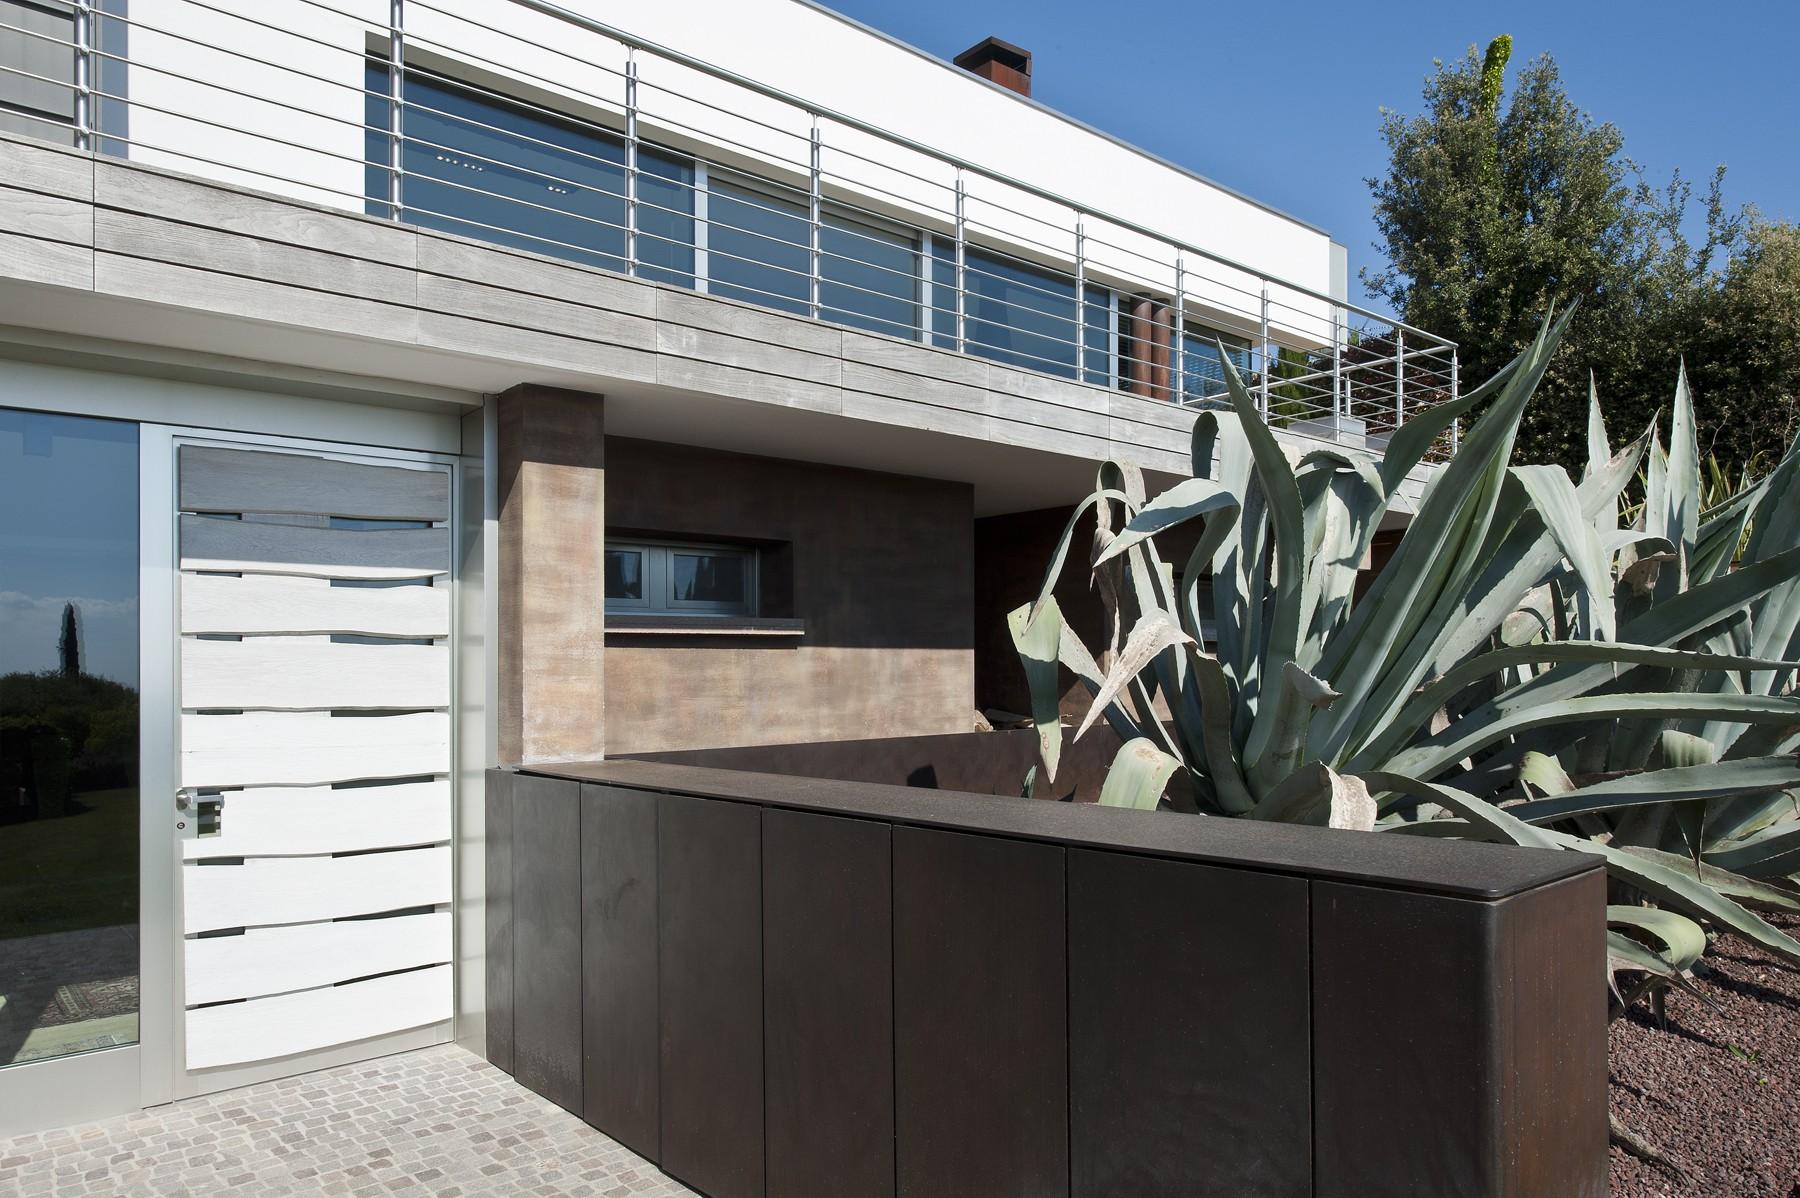 Villa in Vendita a Padenghe Sul Garda: 5 locali, 450 mq - Foto 5